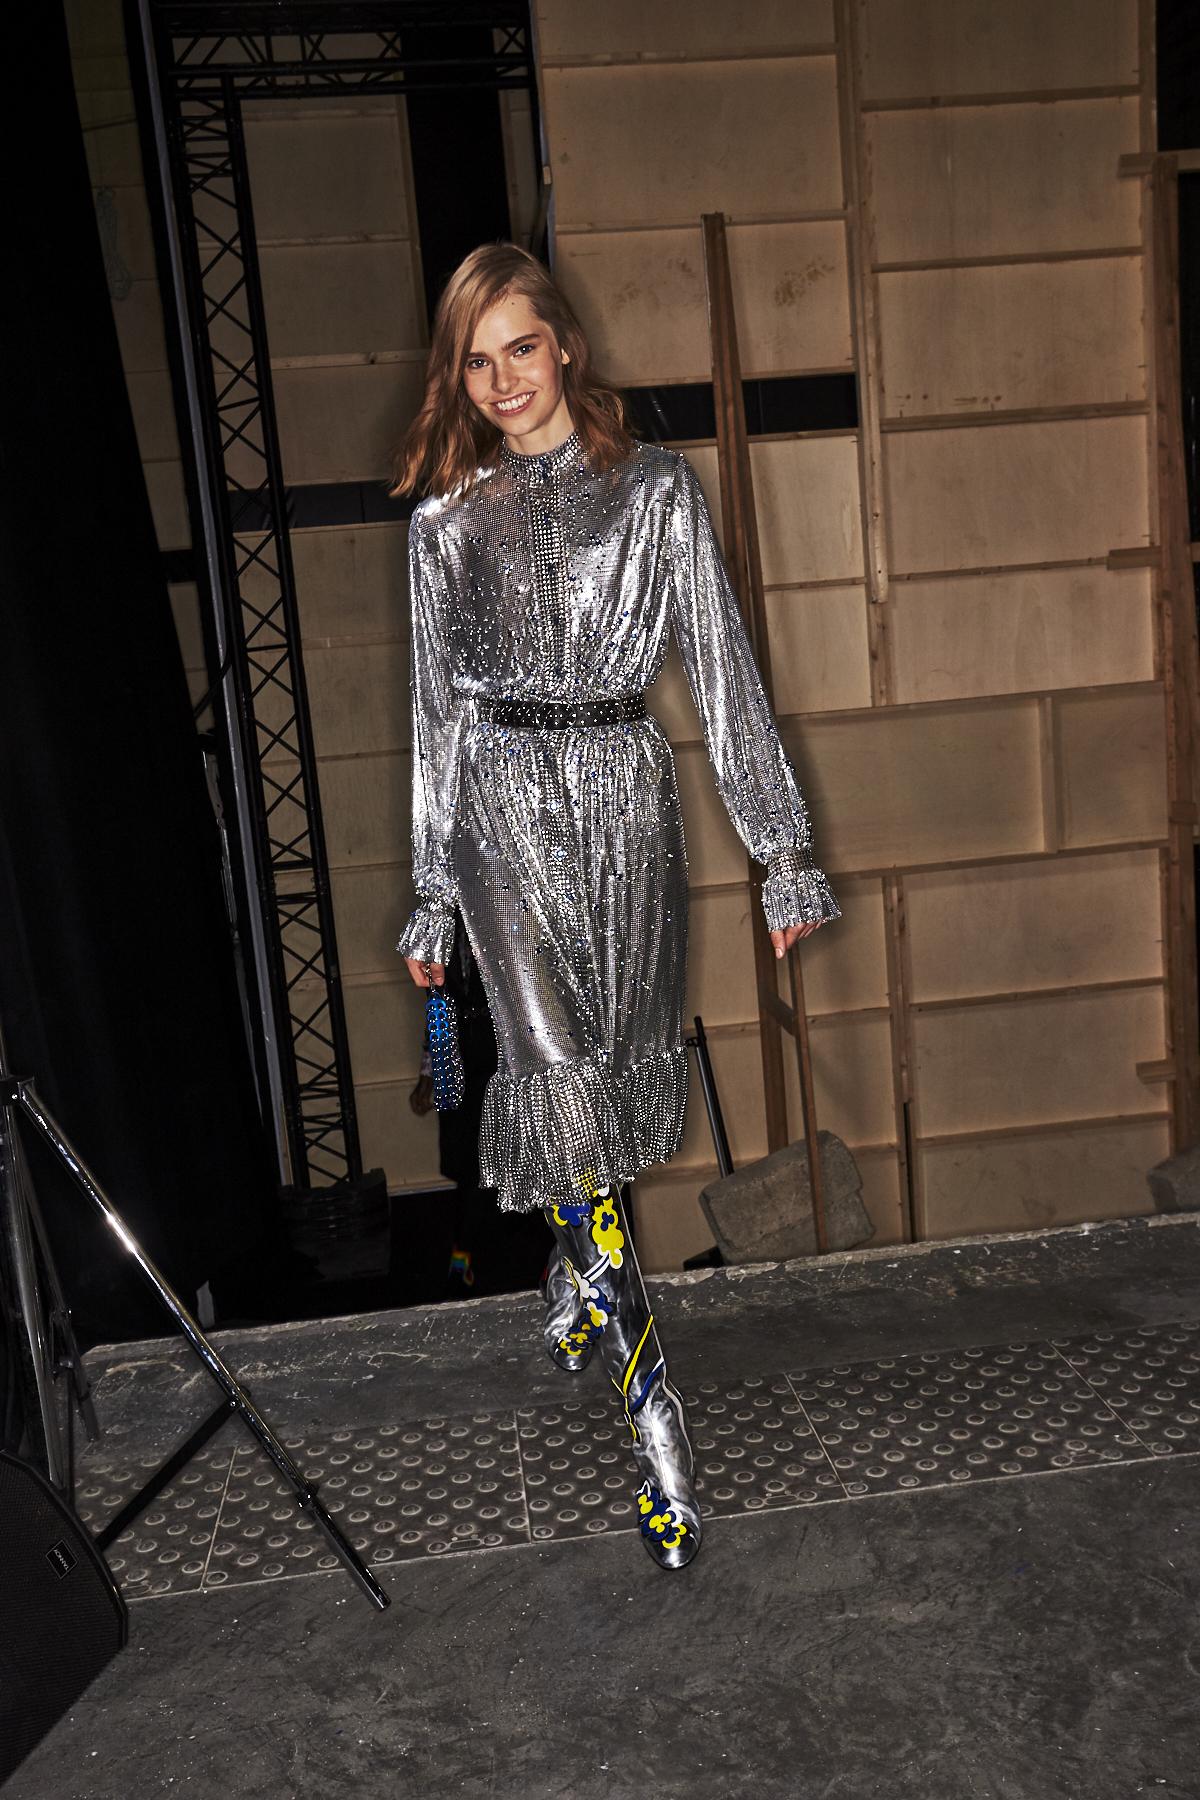 Paco Rabbane SS20 Fashion Show Paris Backstage